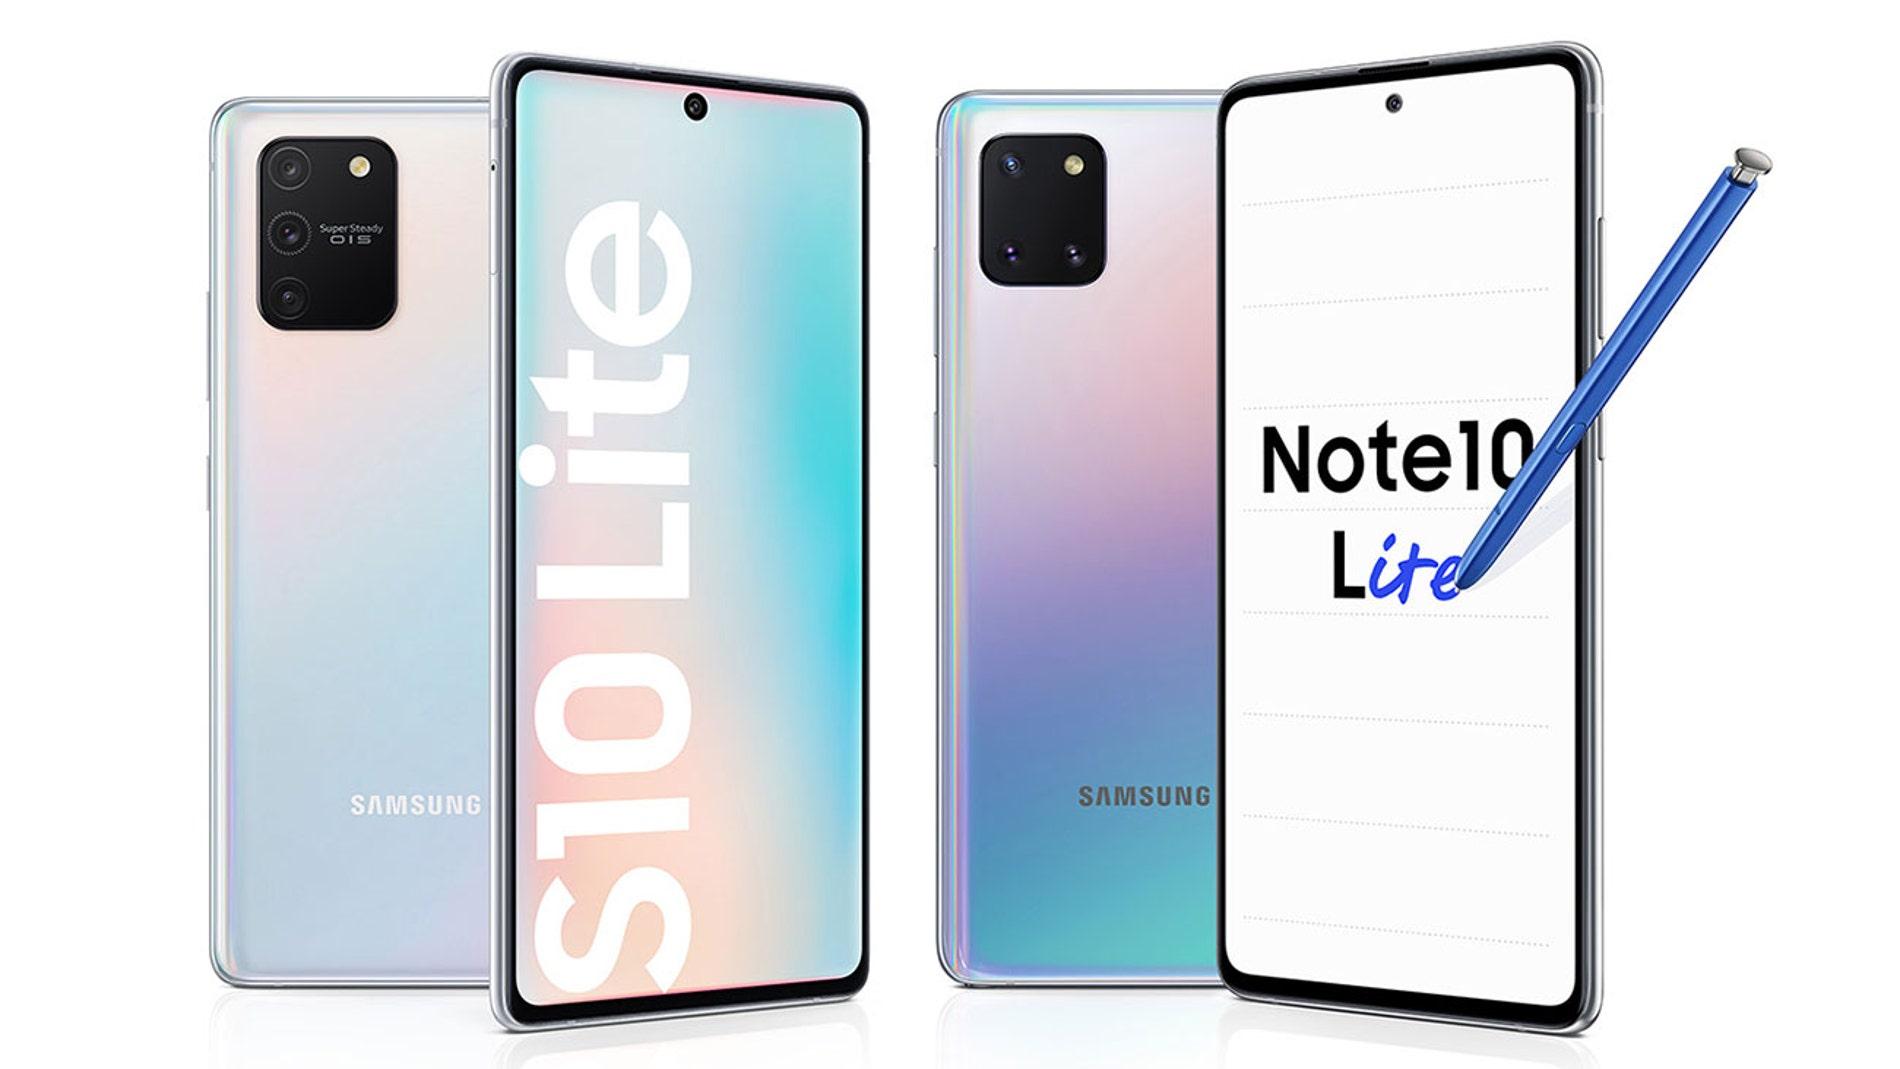 Samsung Galaxy S10 Lite y Galaxy Note 10 Lite